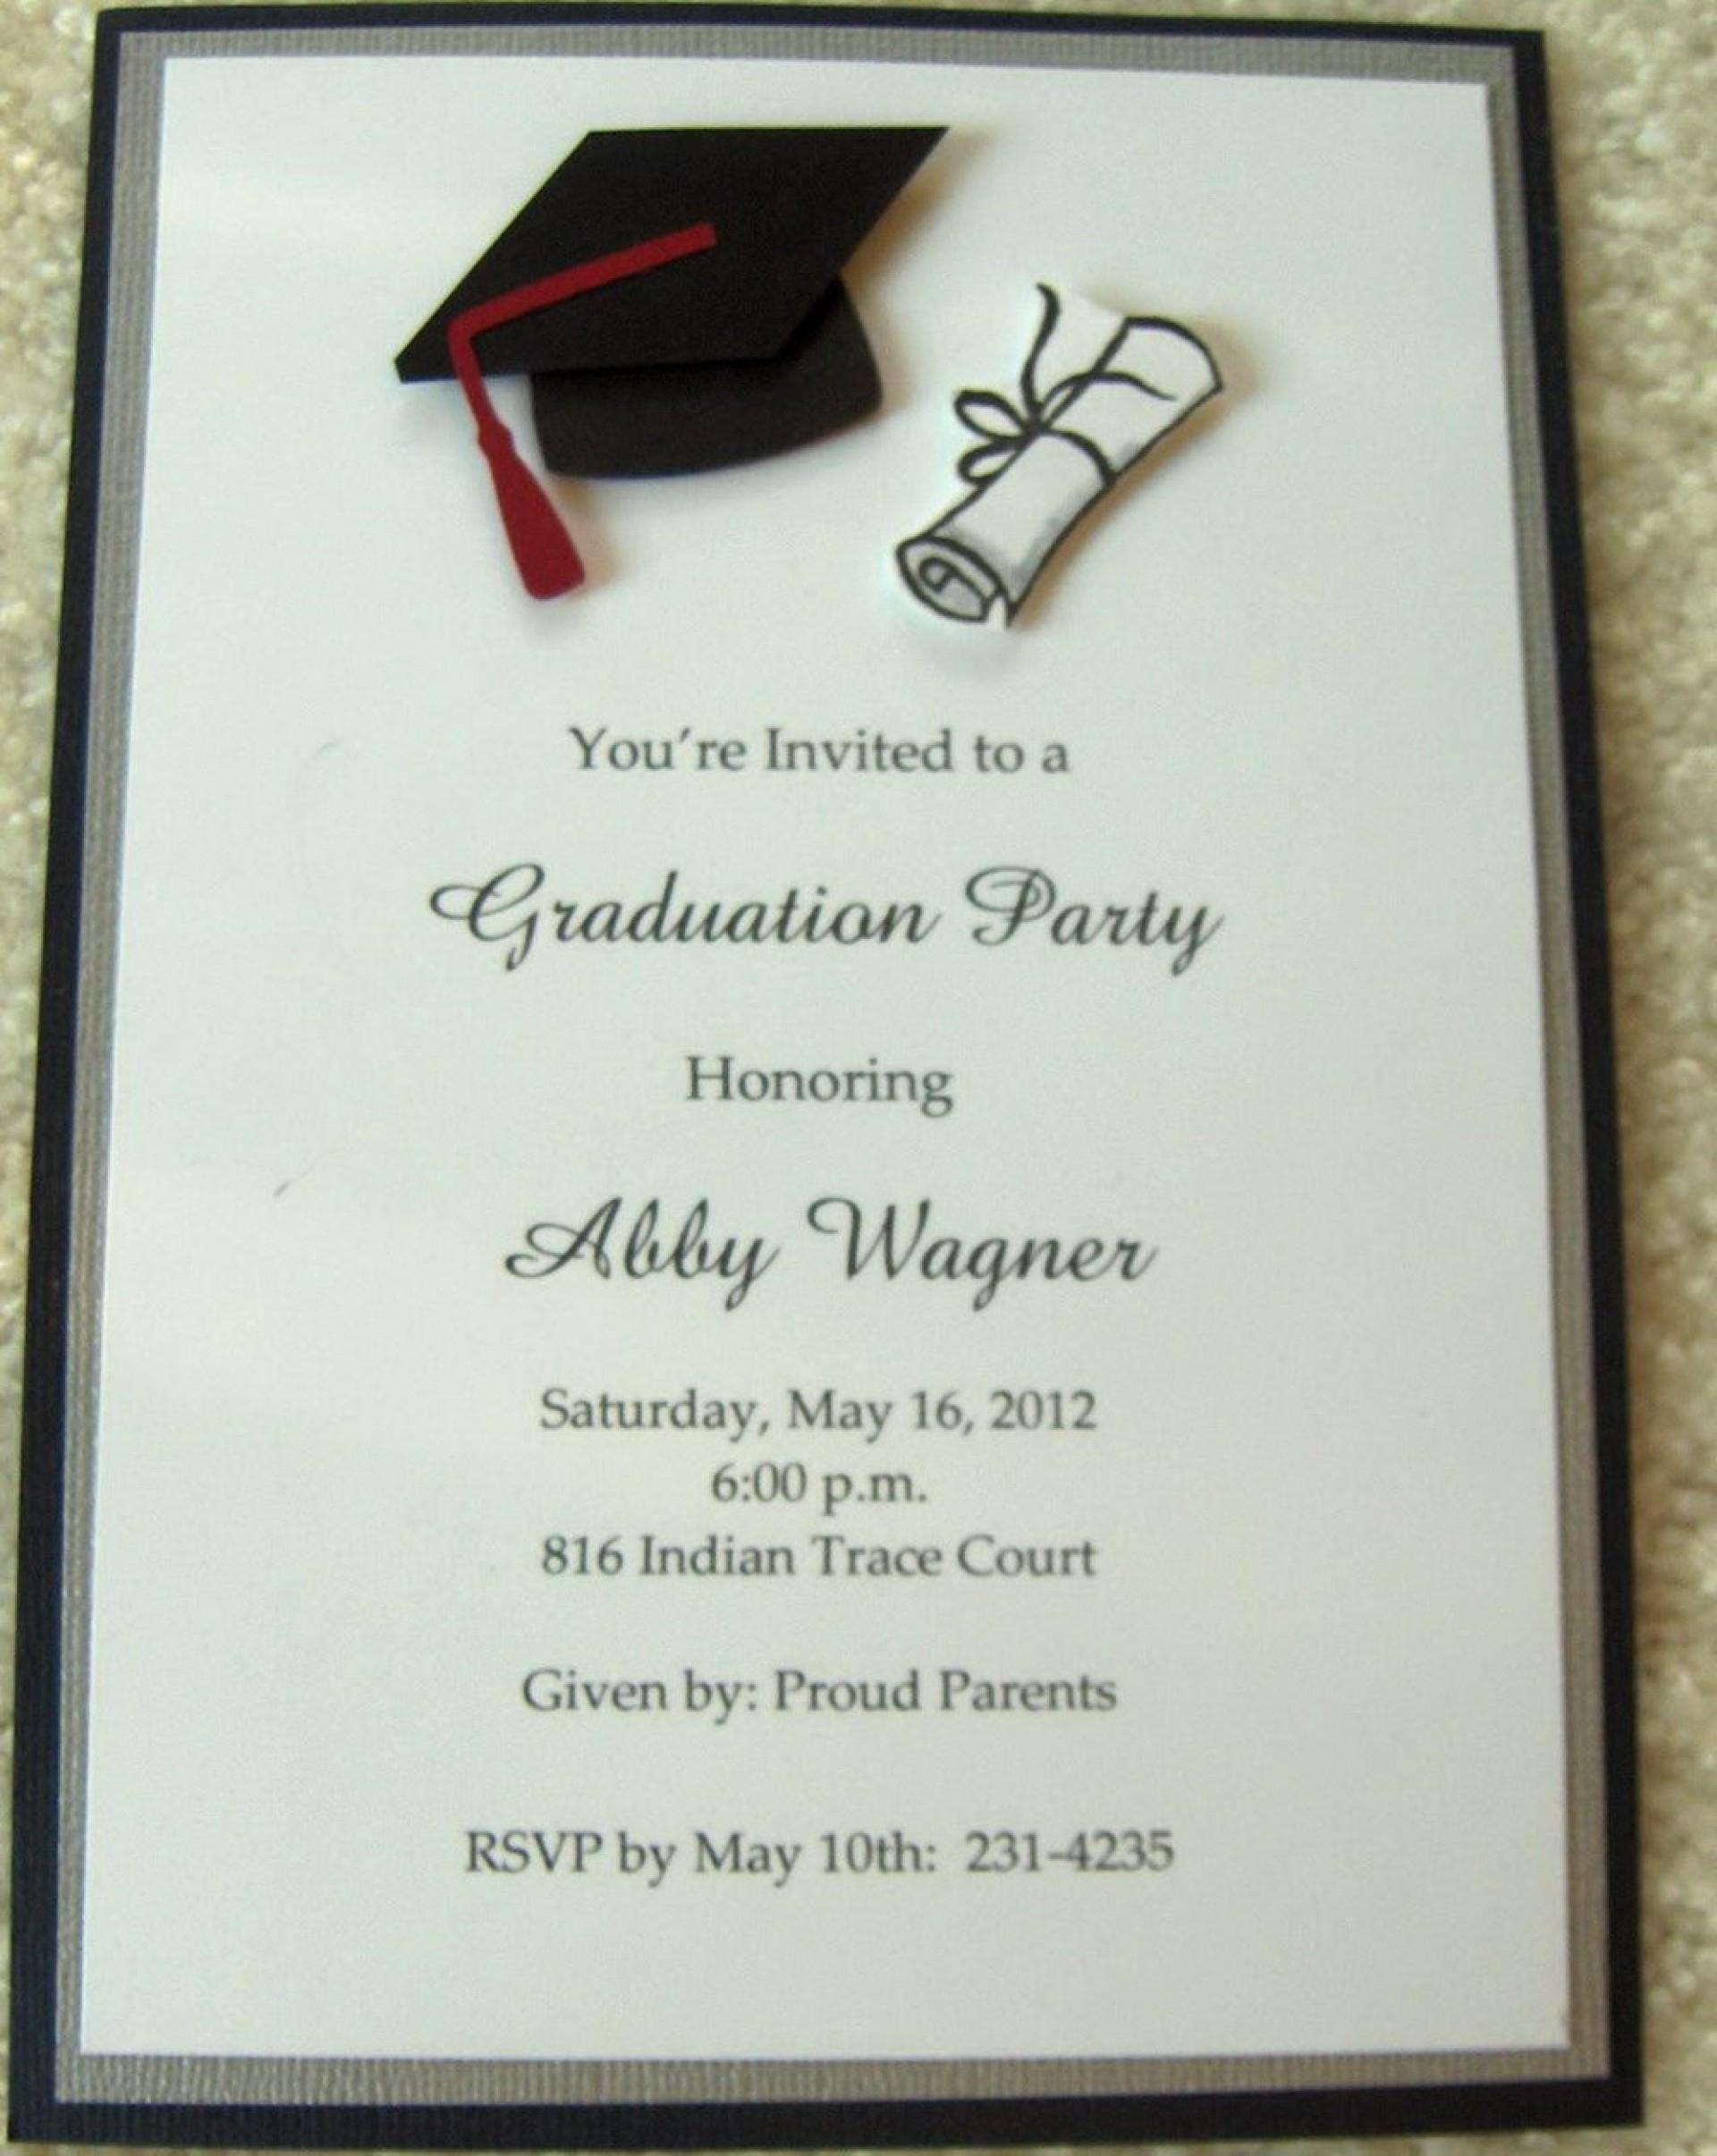 009 Template Ideas Graduation Party Sensational Invitation Pertaining To Graduation Party Invitation Templates Free Word